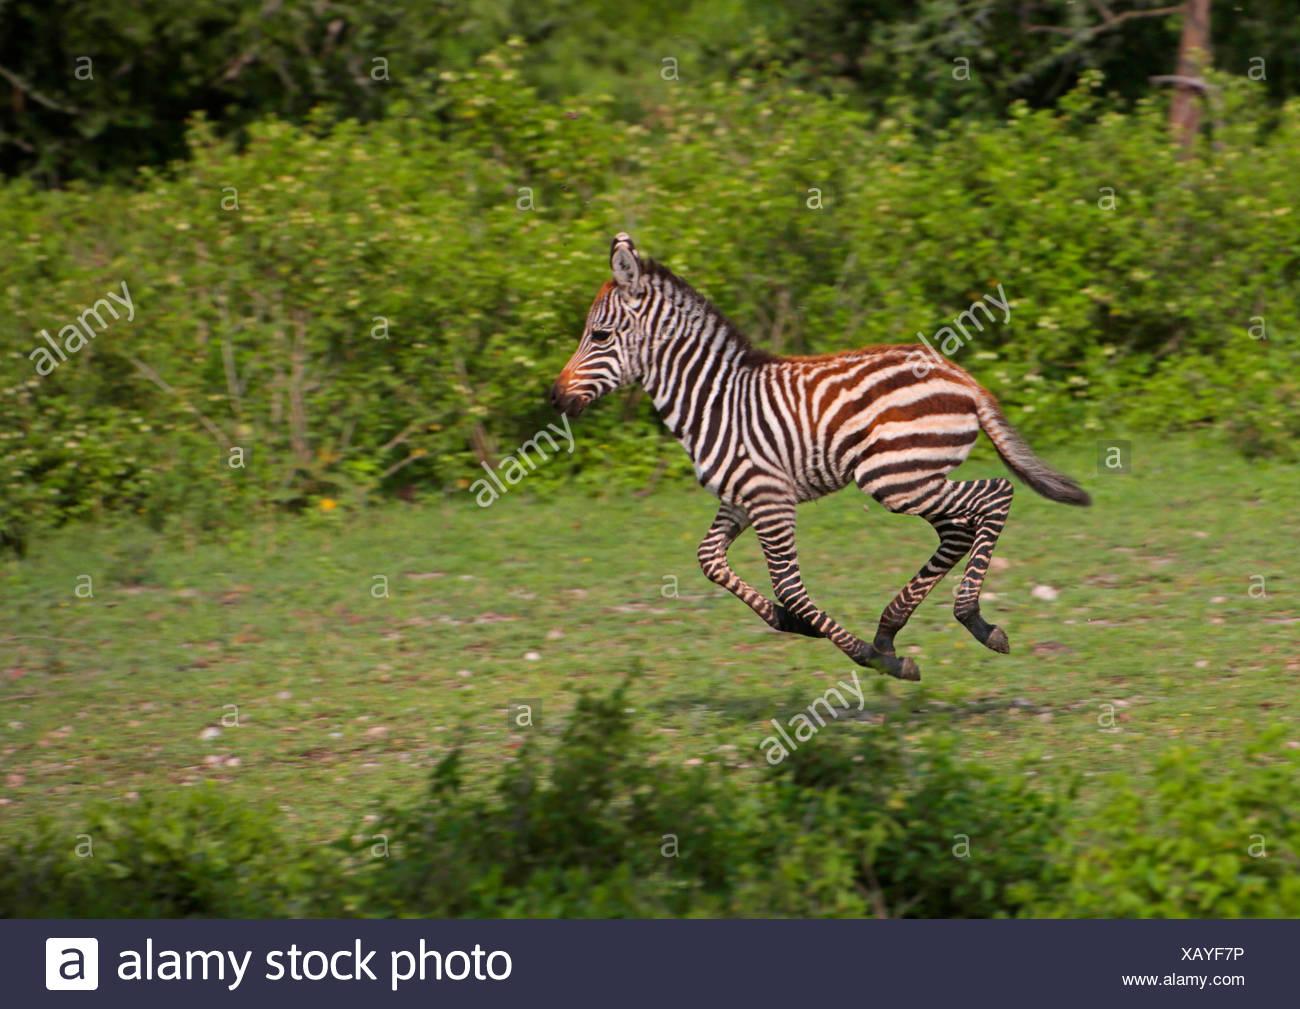 Common Zebra (Equus quagga), foal in the course in a meadow, Tanzania, Serengeti National Park - Stock Image